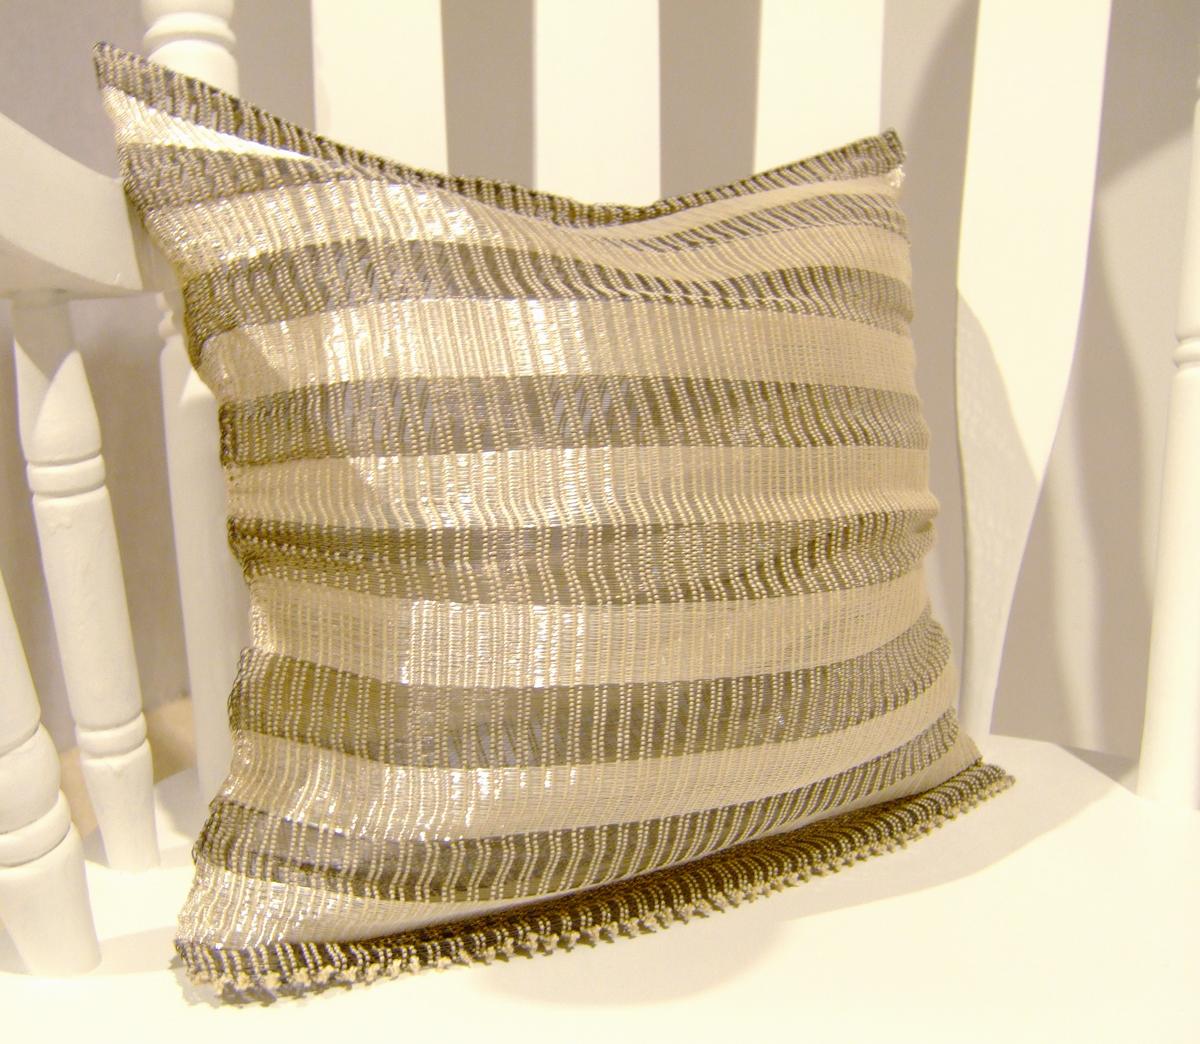 Cold Comfort - Throw Pillow Detail